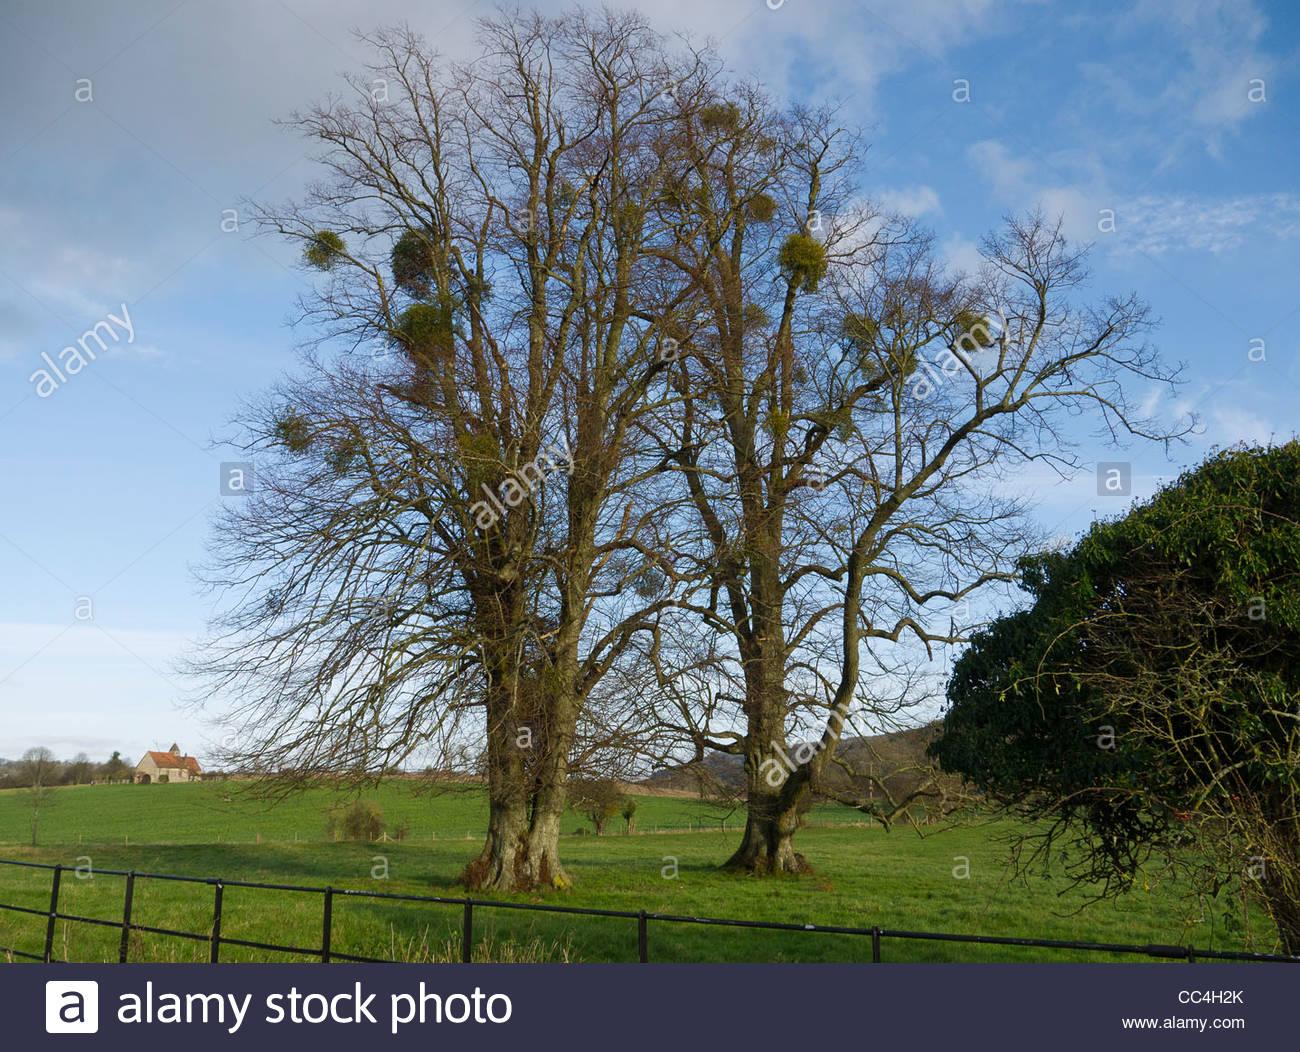 European mistletoe attached to Host Tree Full Length Landscape - Stock Image